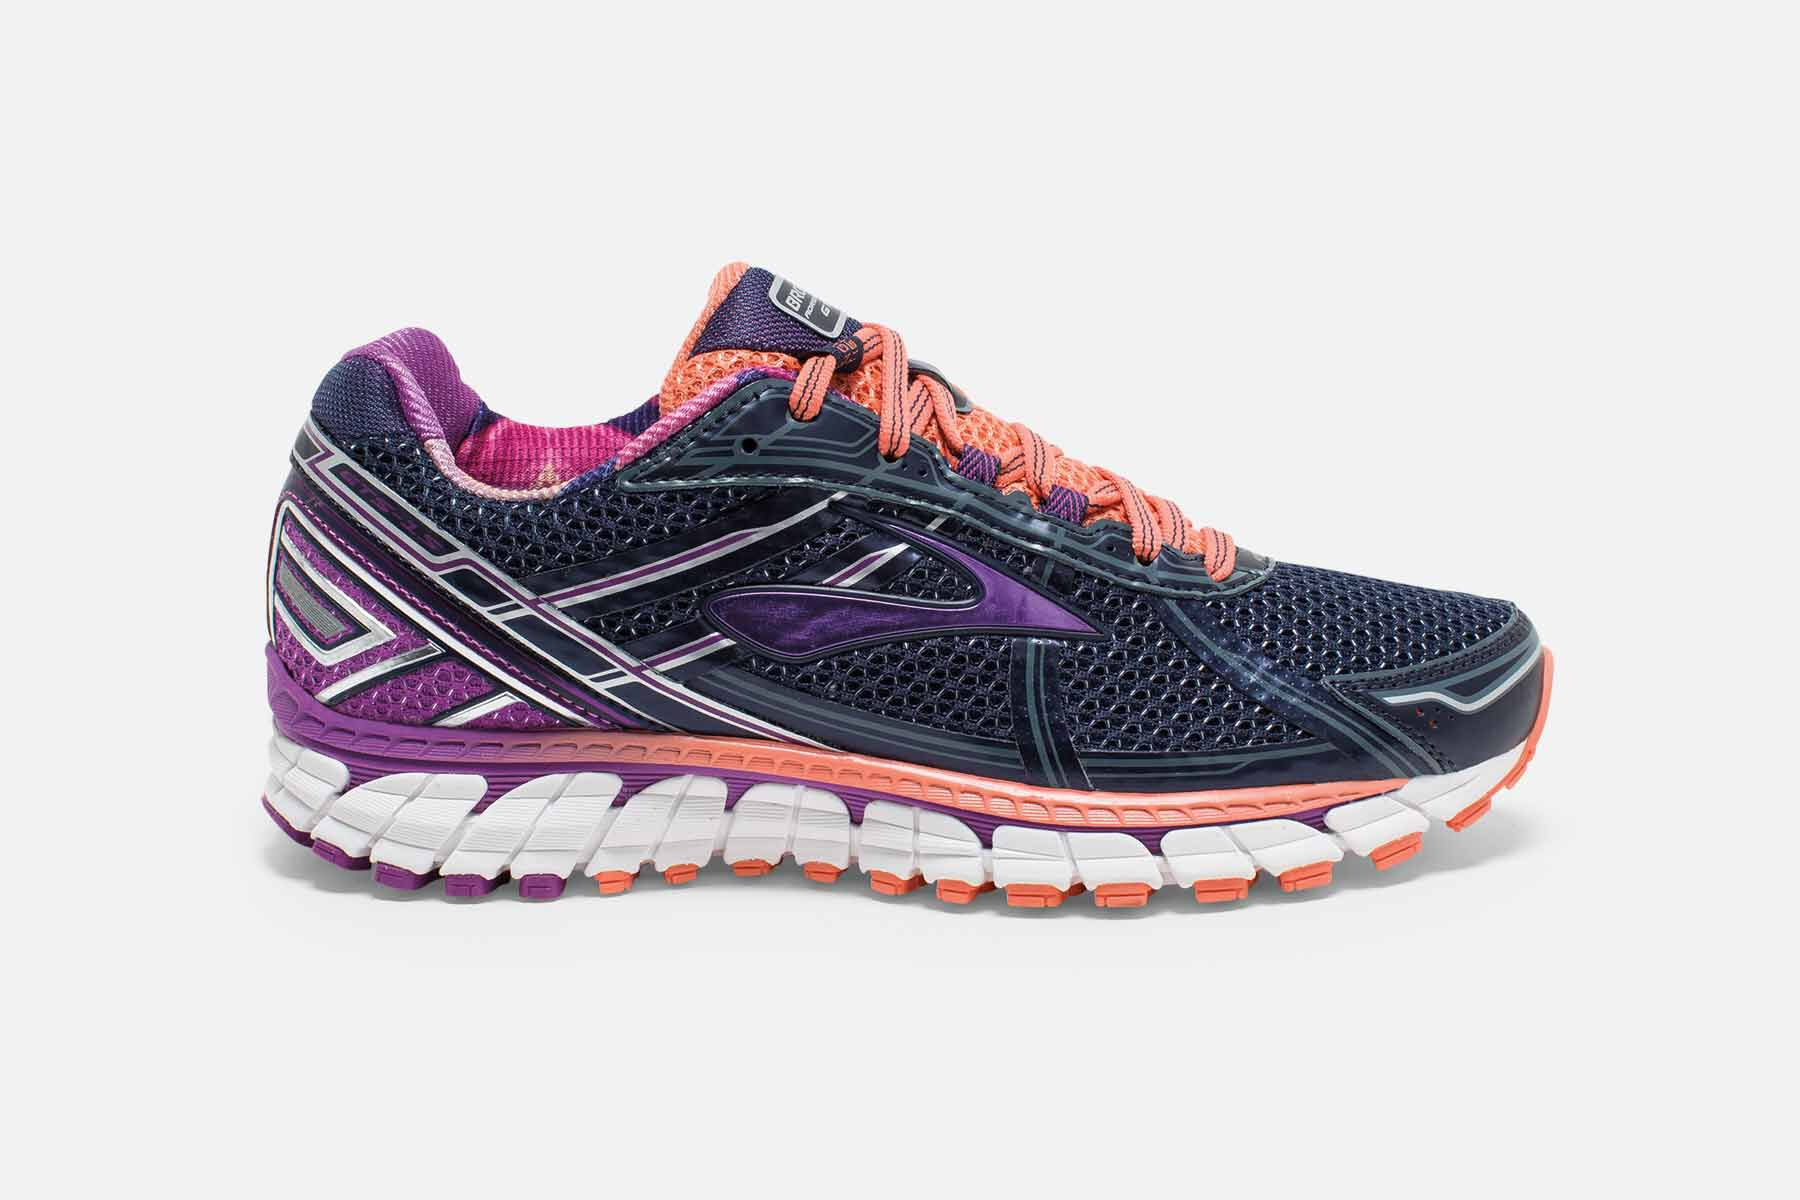 Adrenaline GTS 15 Running Shoes